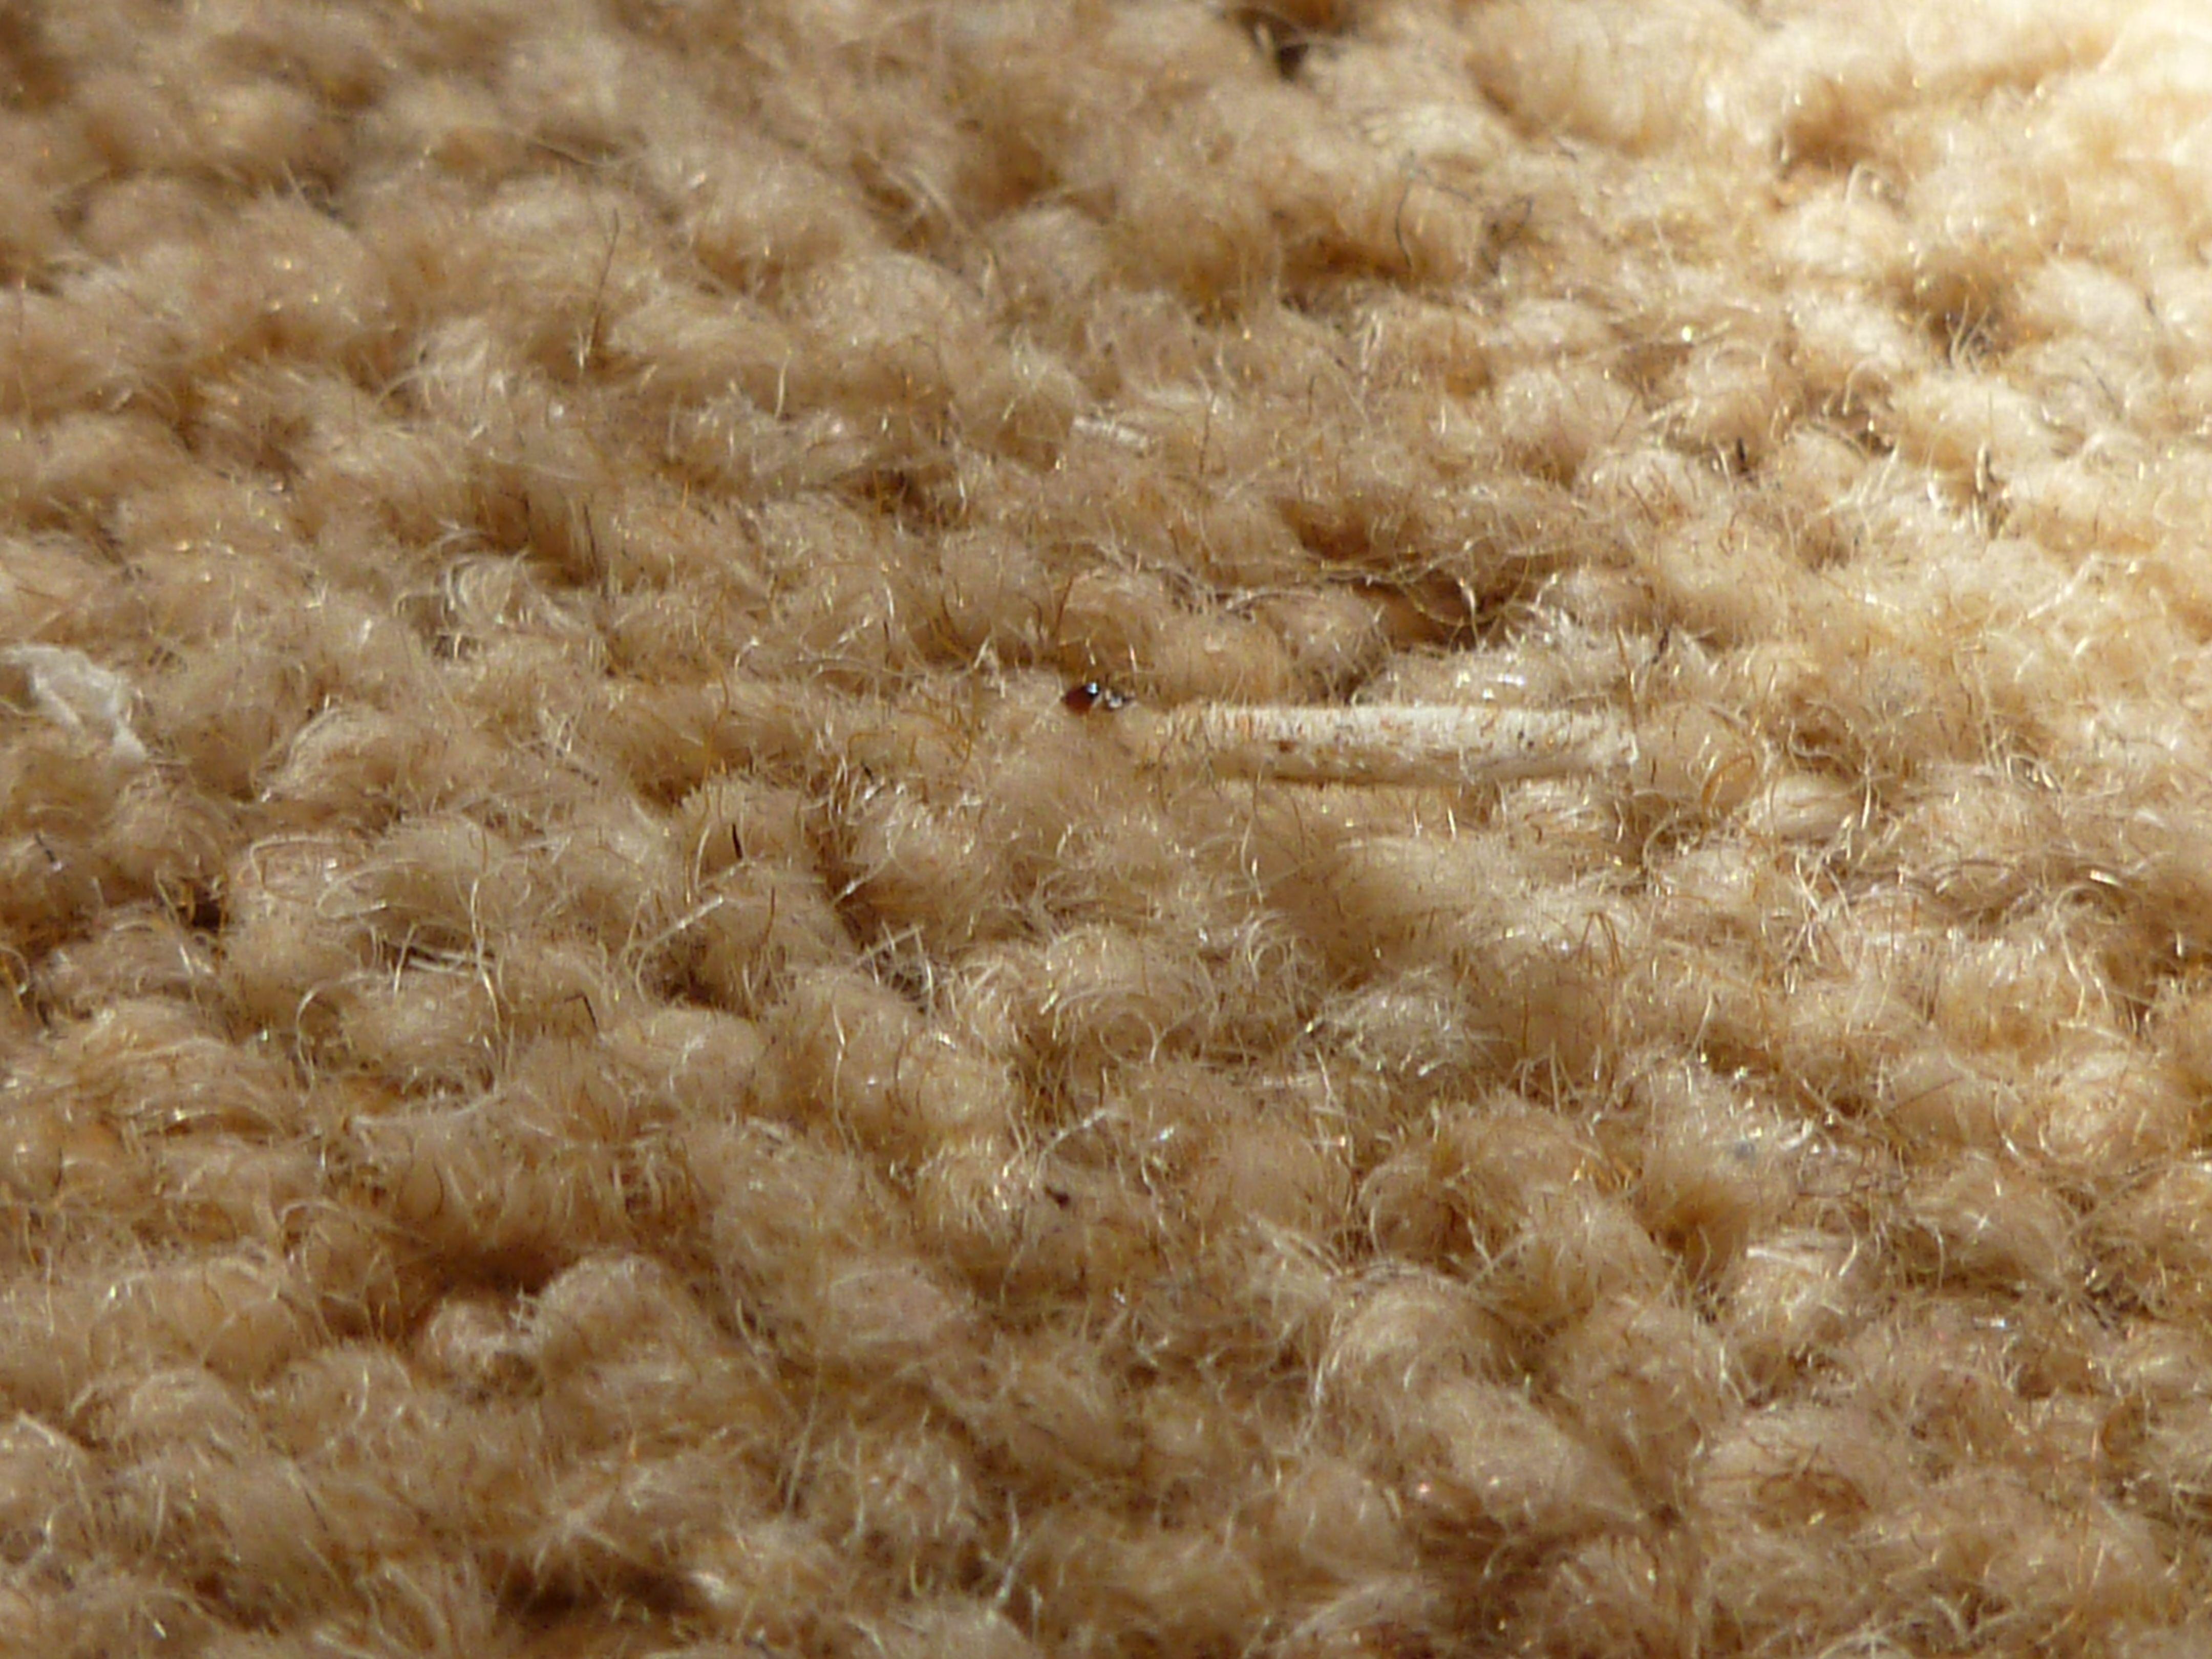 Rug Moth Larvae Tucking Into An Expensive Wool Carpet